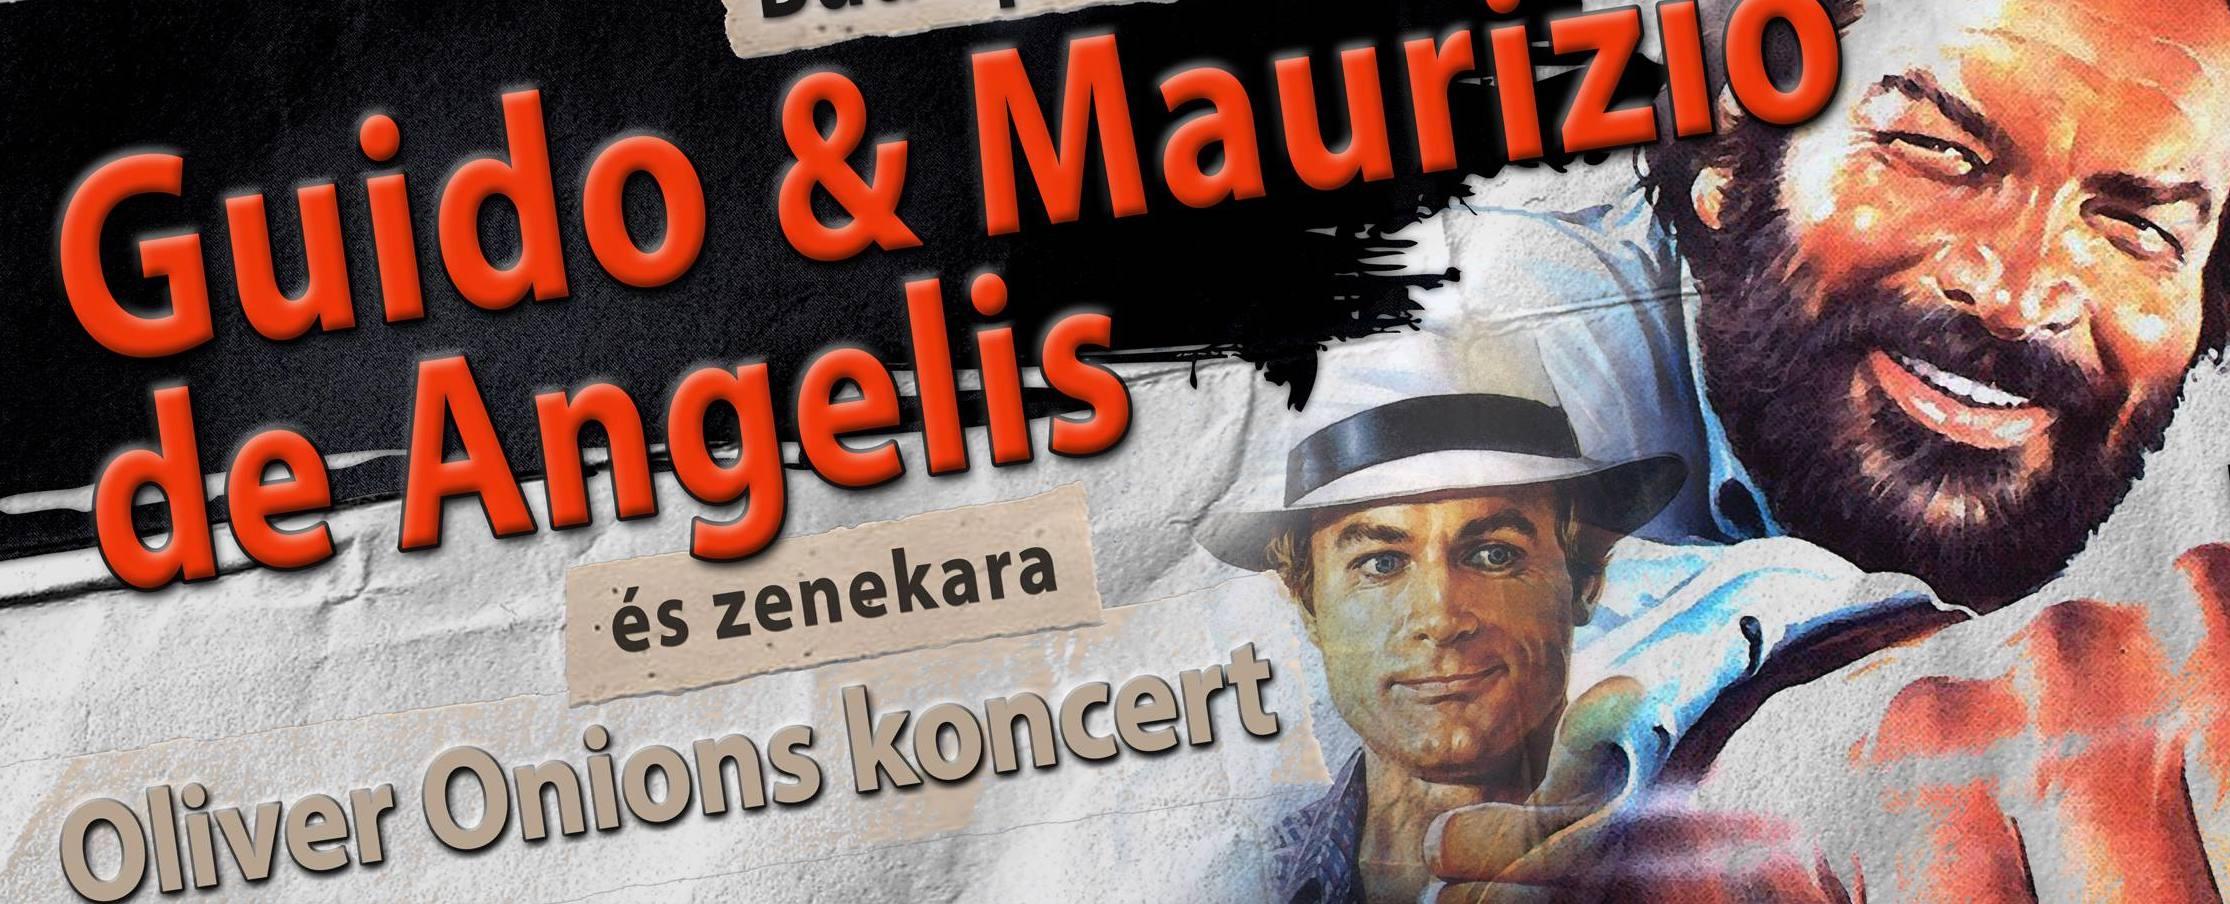 Guido & Maurizio de Angelis koncert 2019